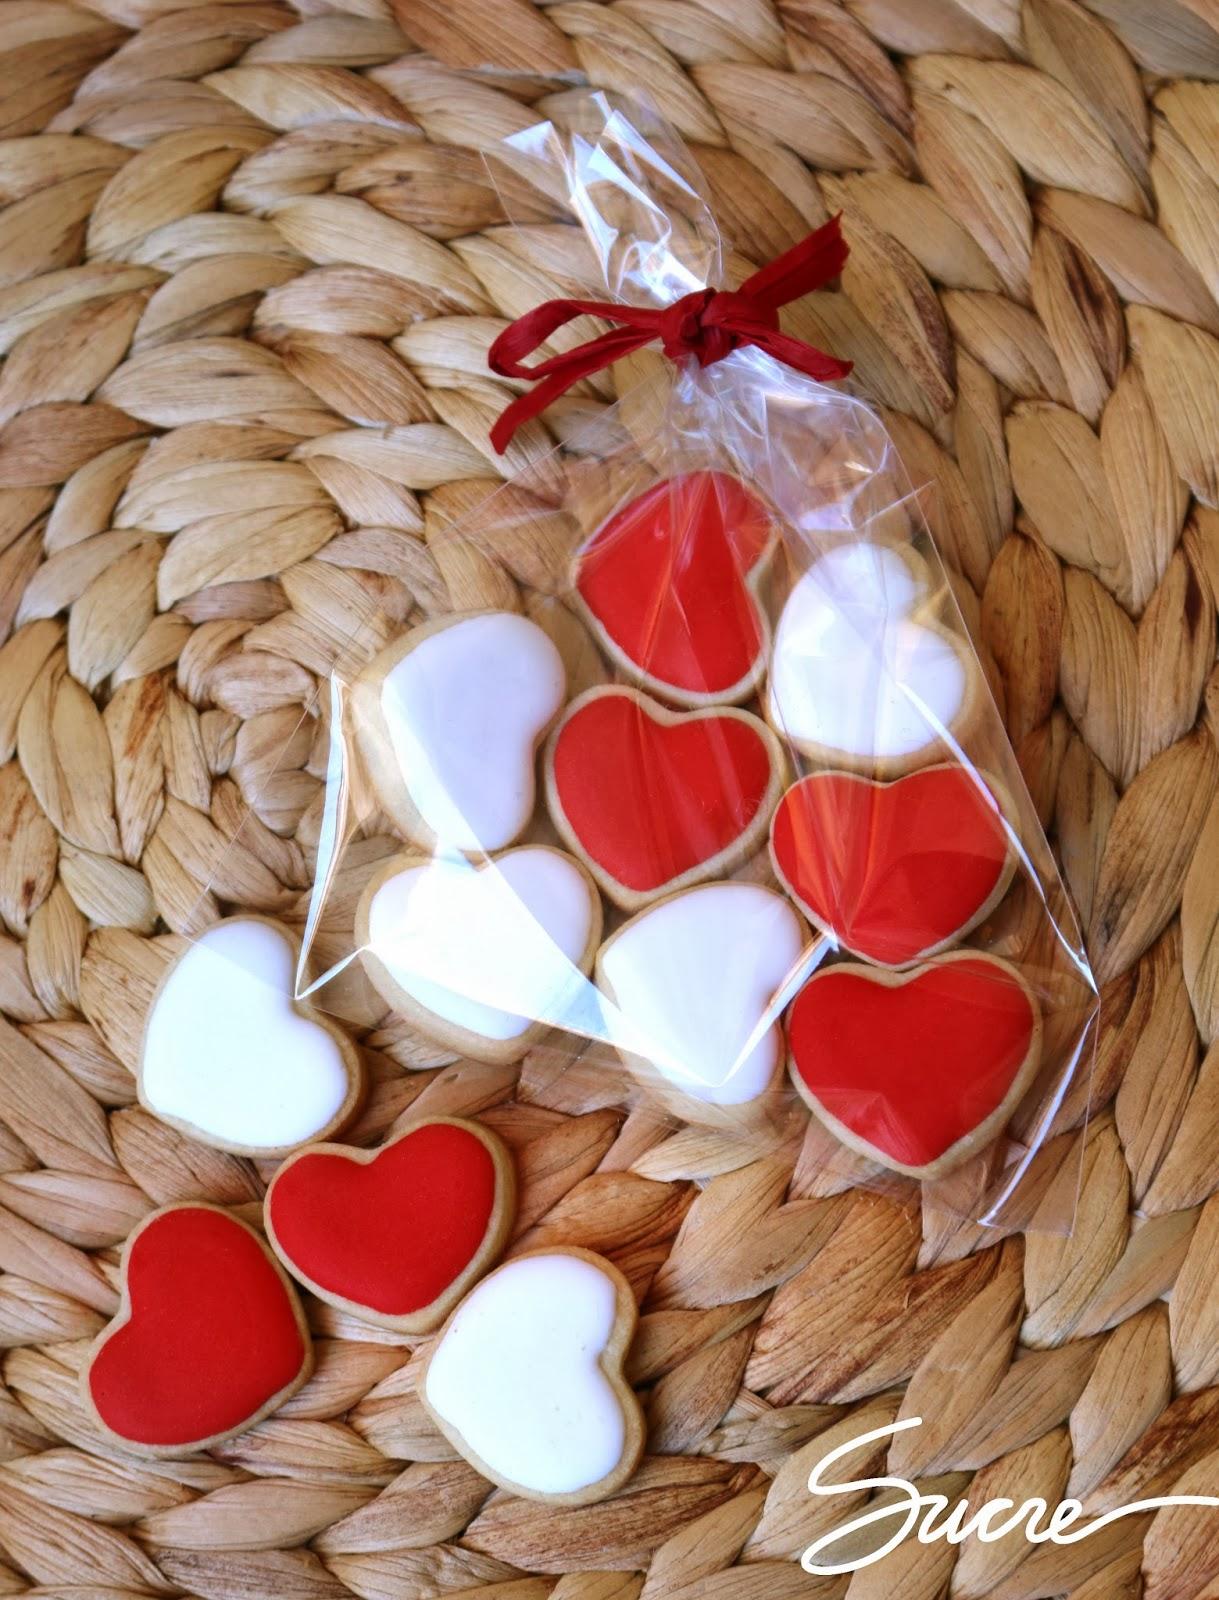 galletas decoradas corazón, galetes decorades cor, heart decorated cookies